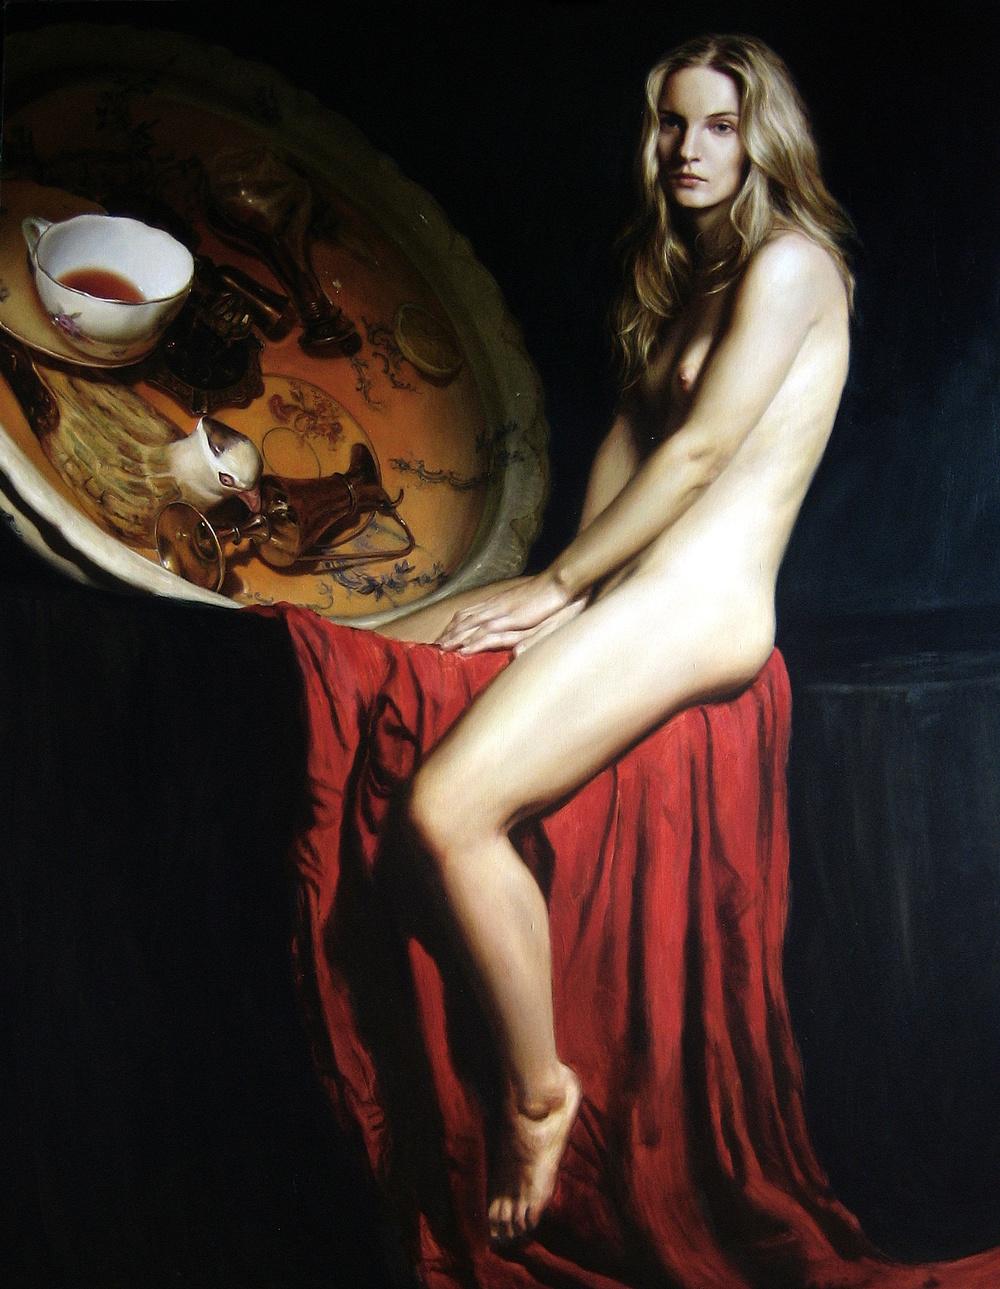 140 x 110 cmOil on canvas 2015